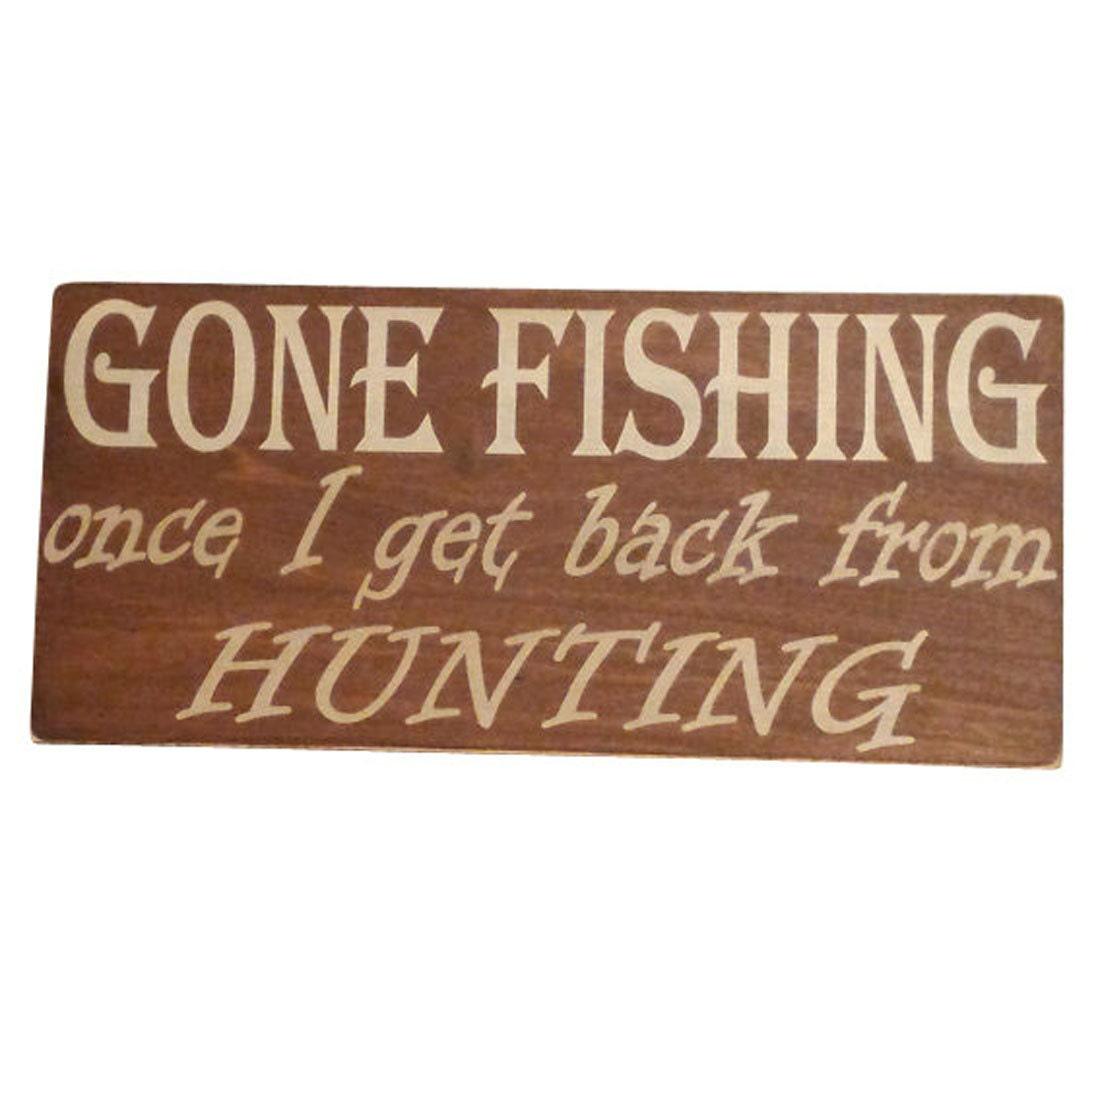 fishing sign hunting sign custom sign gone fishing